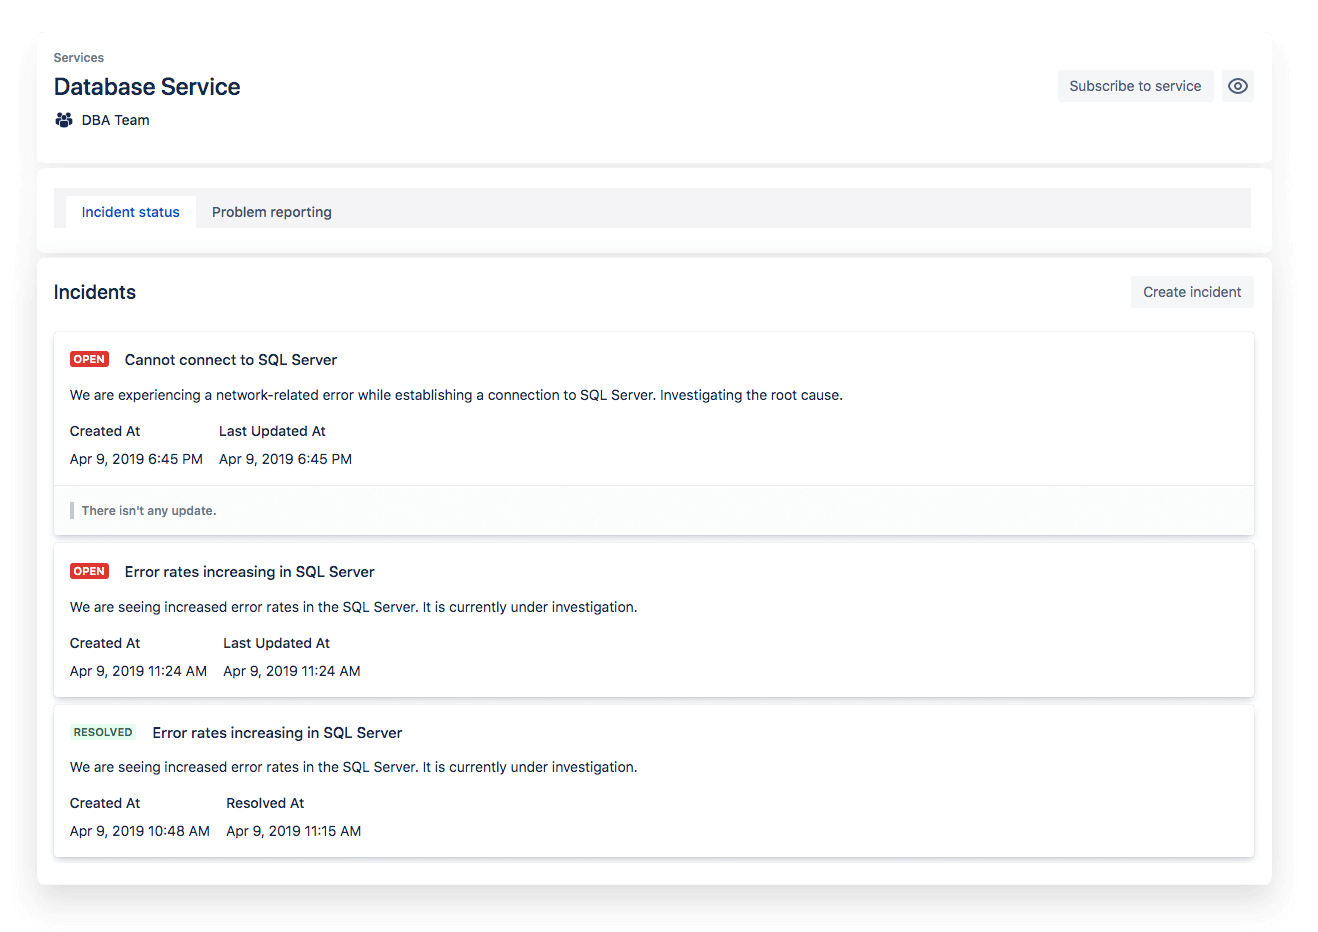 Service status snapshot